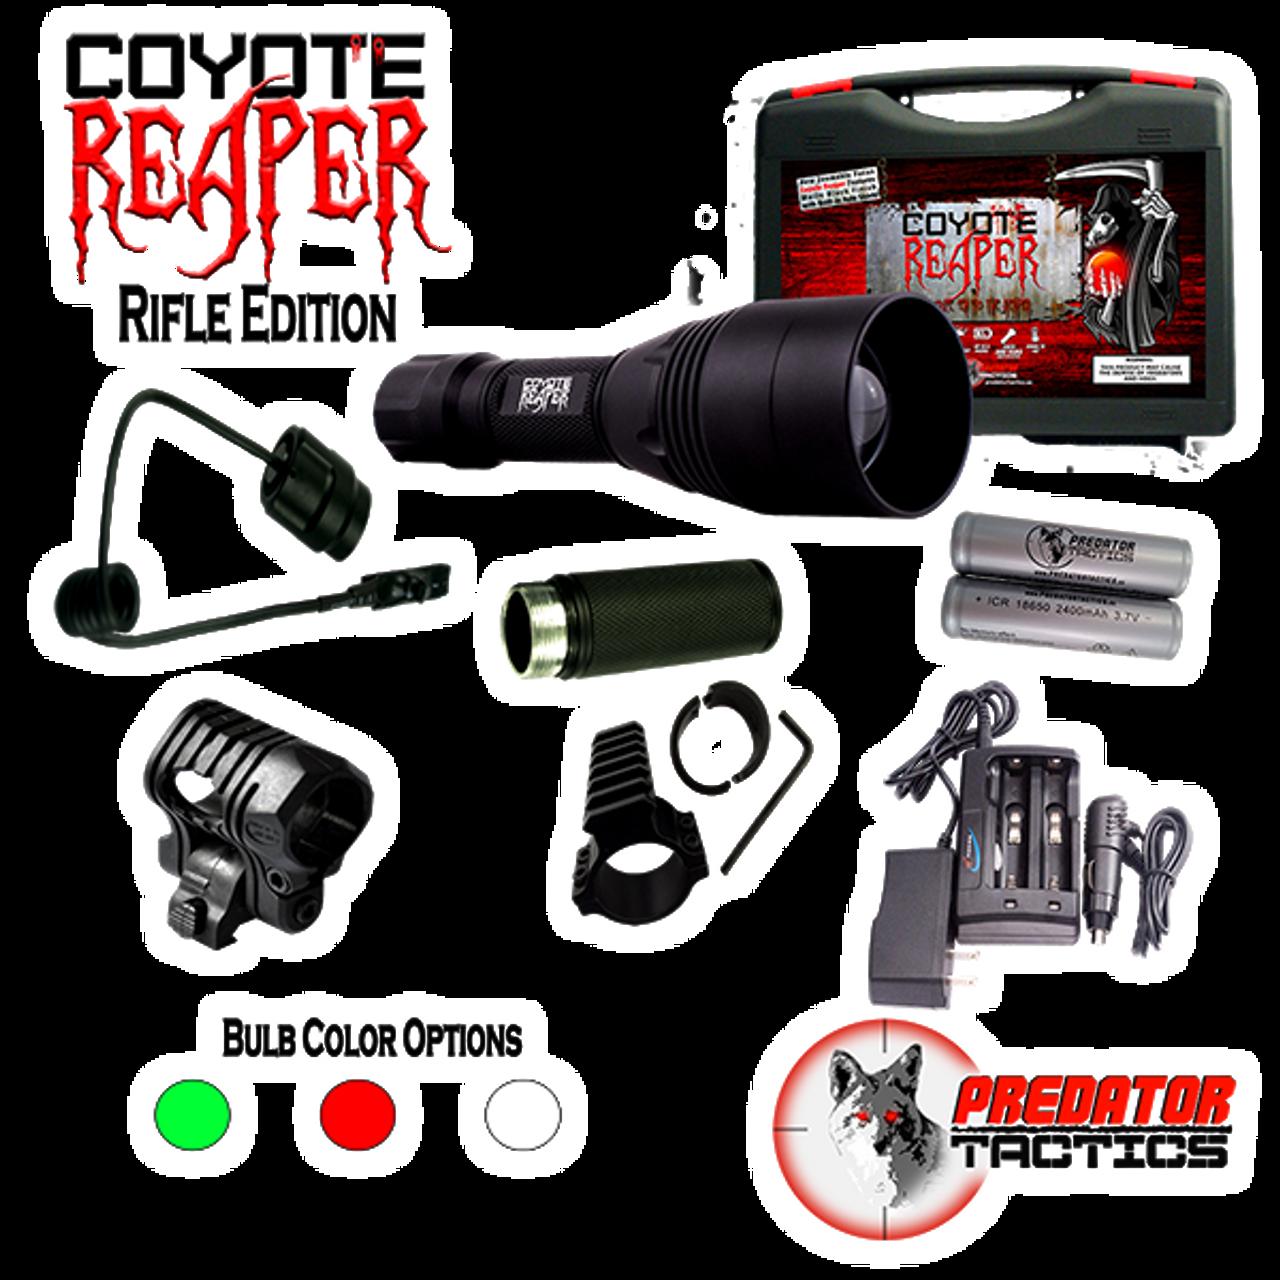 Predator Tactics Coyote Reaper XXL Green//Red//White LED Kit Night Hunting Light